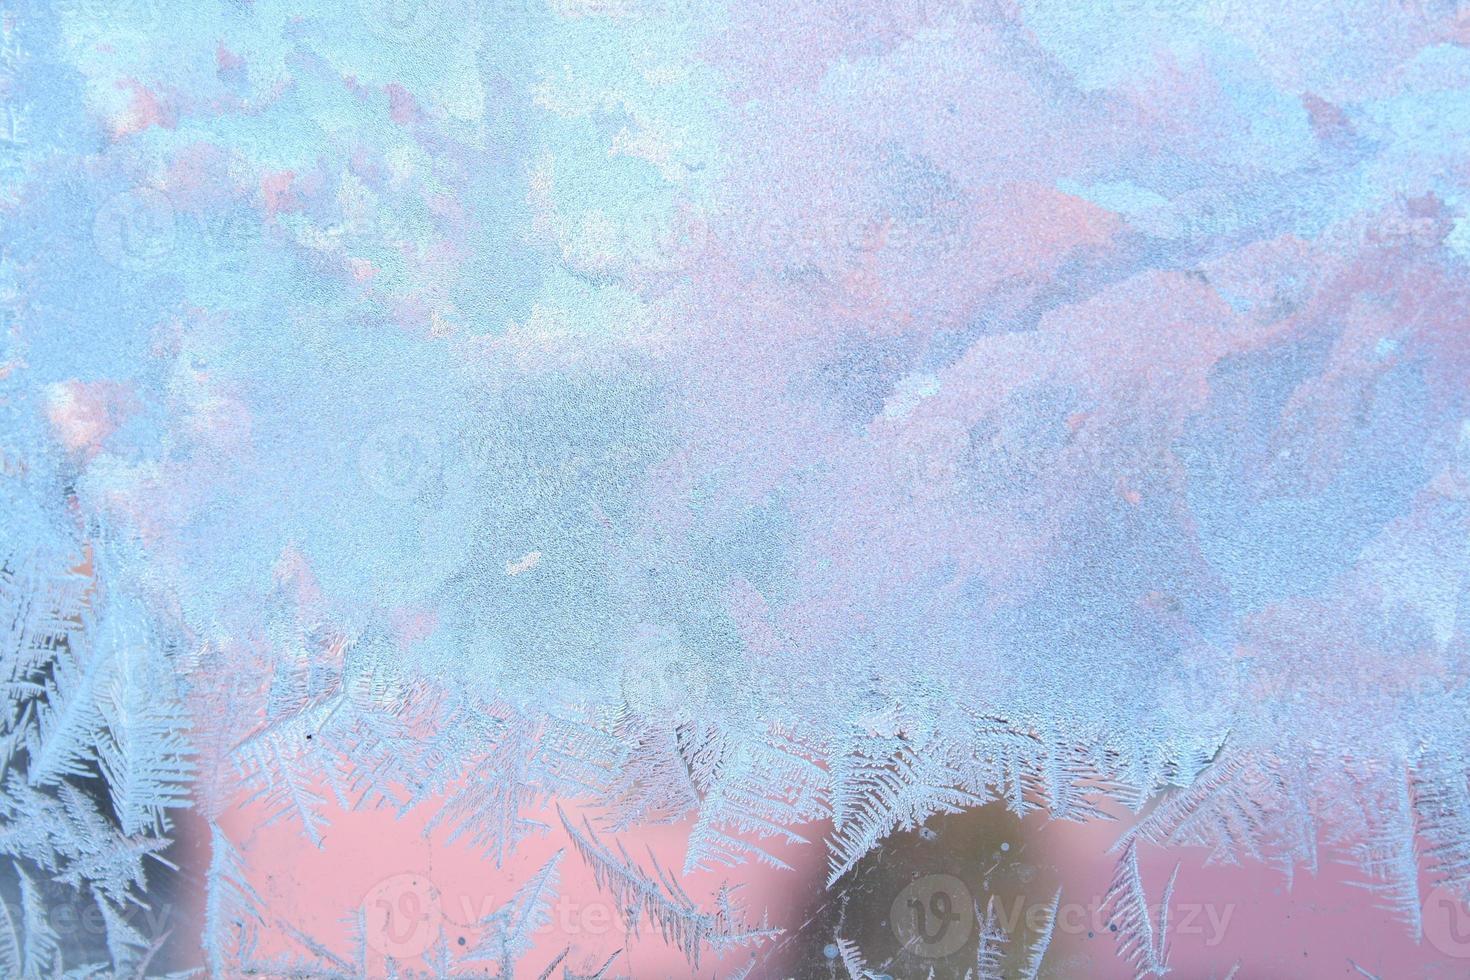 Frost on winter window photo